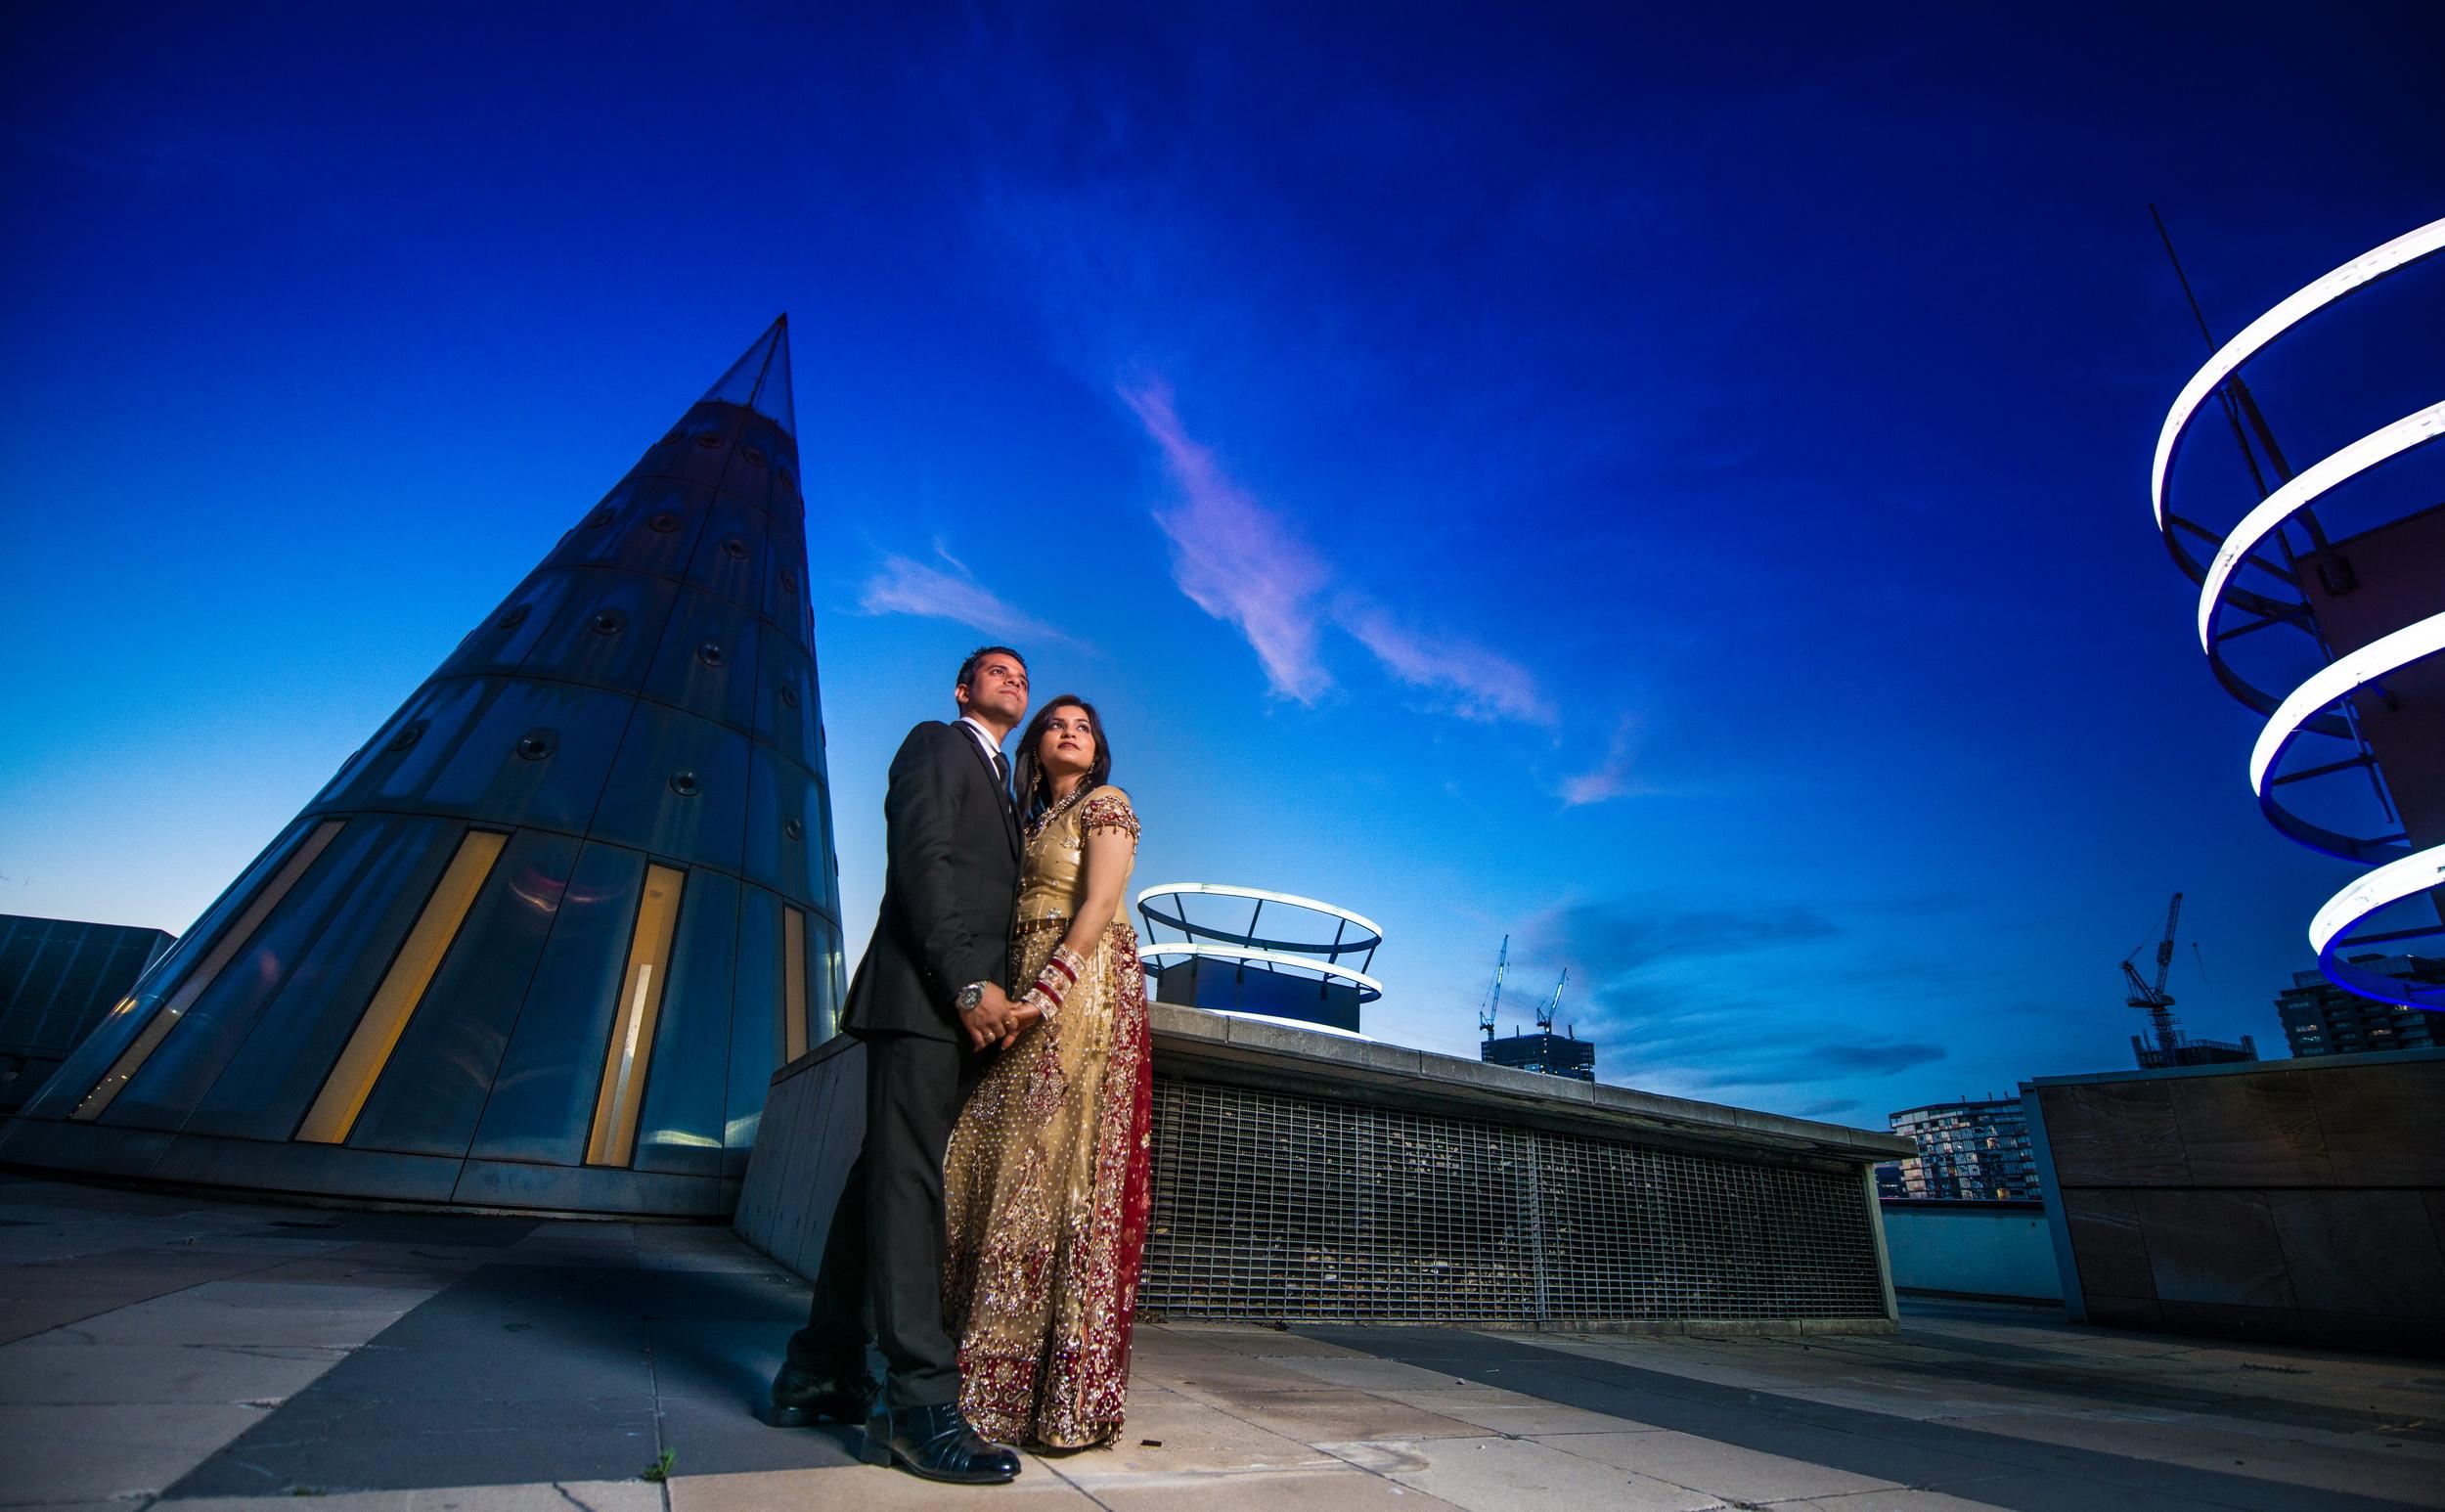 Wedding - Shivam and Apurva-0643.jpg